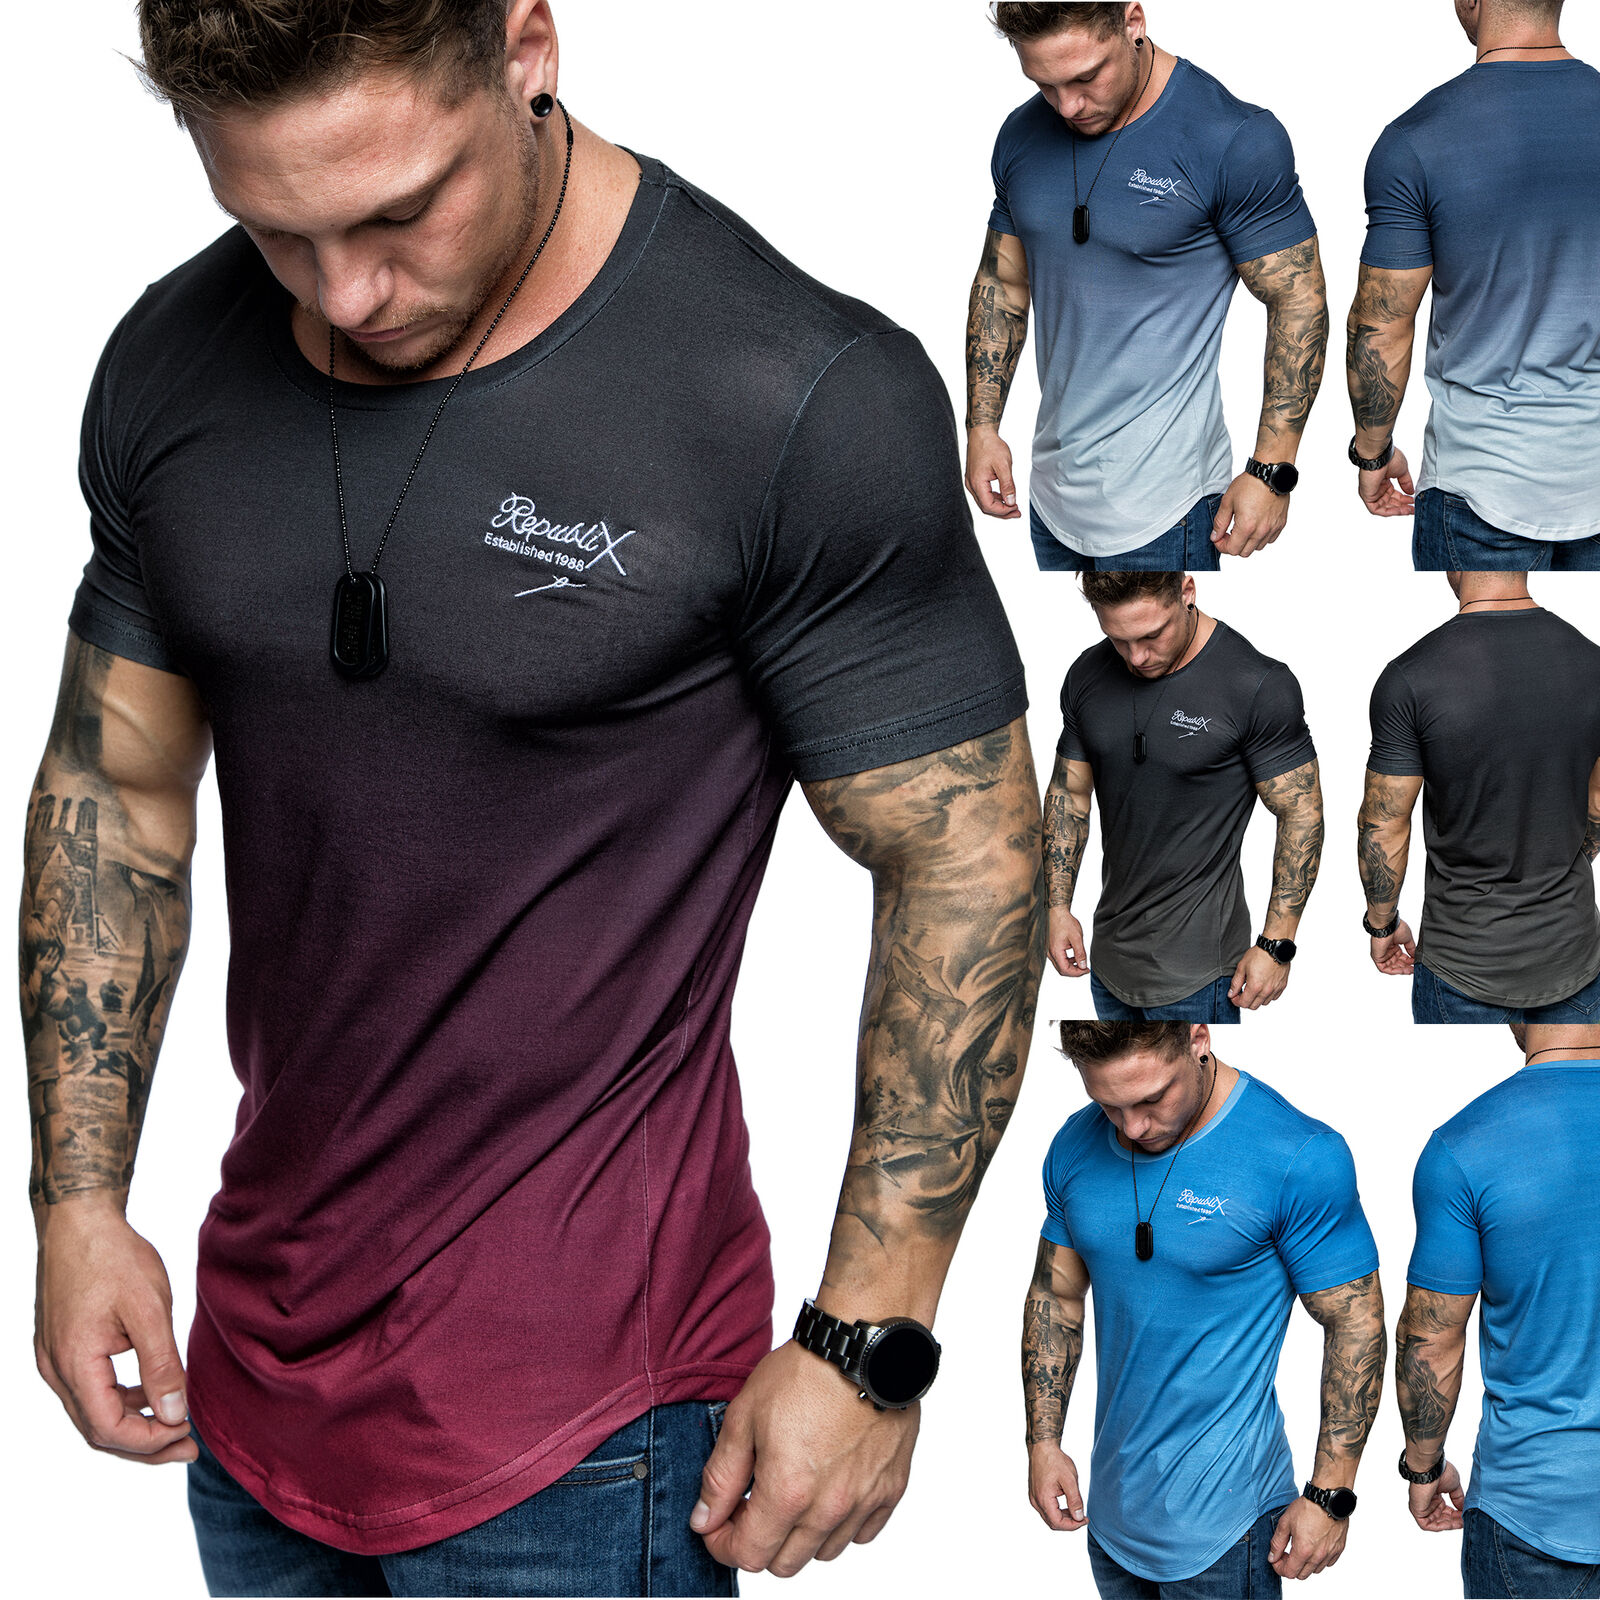 Oversize Herren Crew Neck Body-Fit Waterfall Design Shirt Sommer T-Shirt R-0037